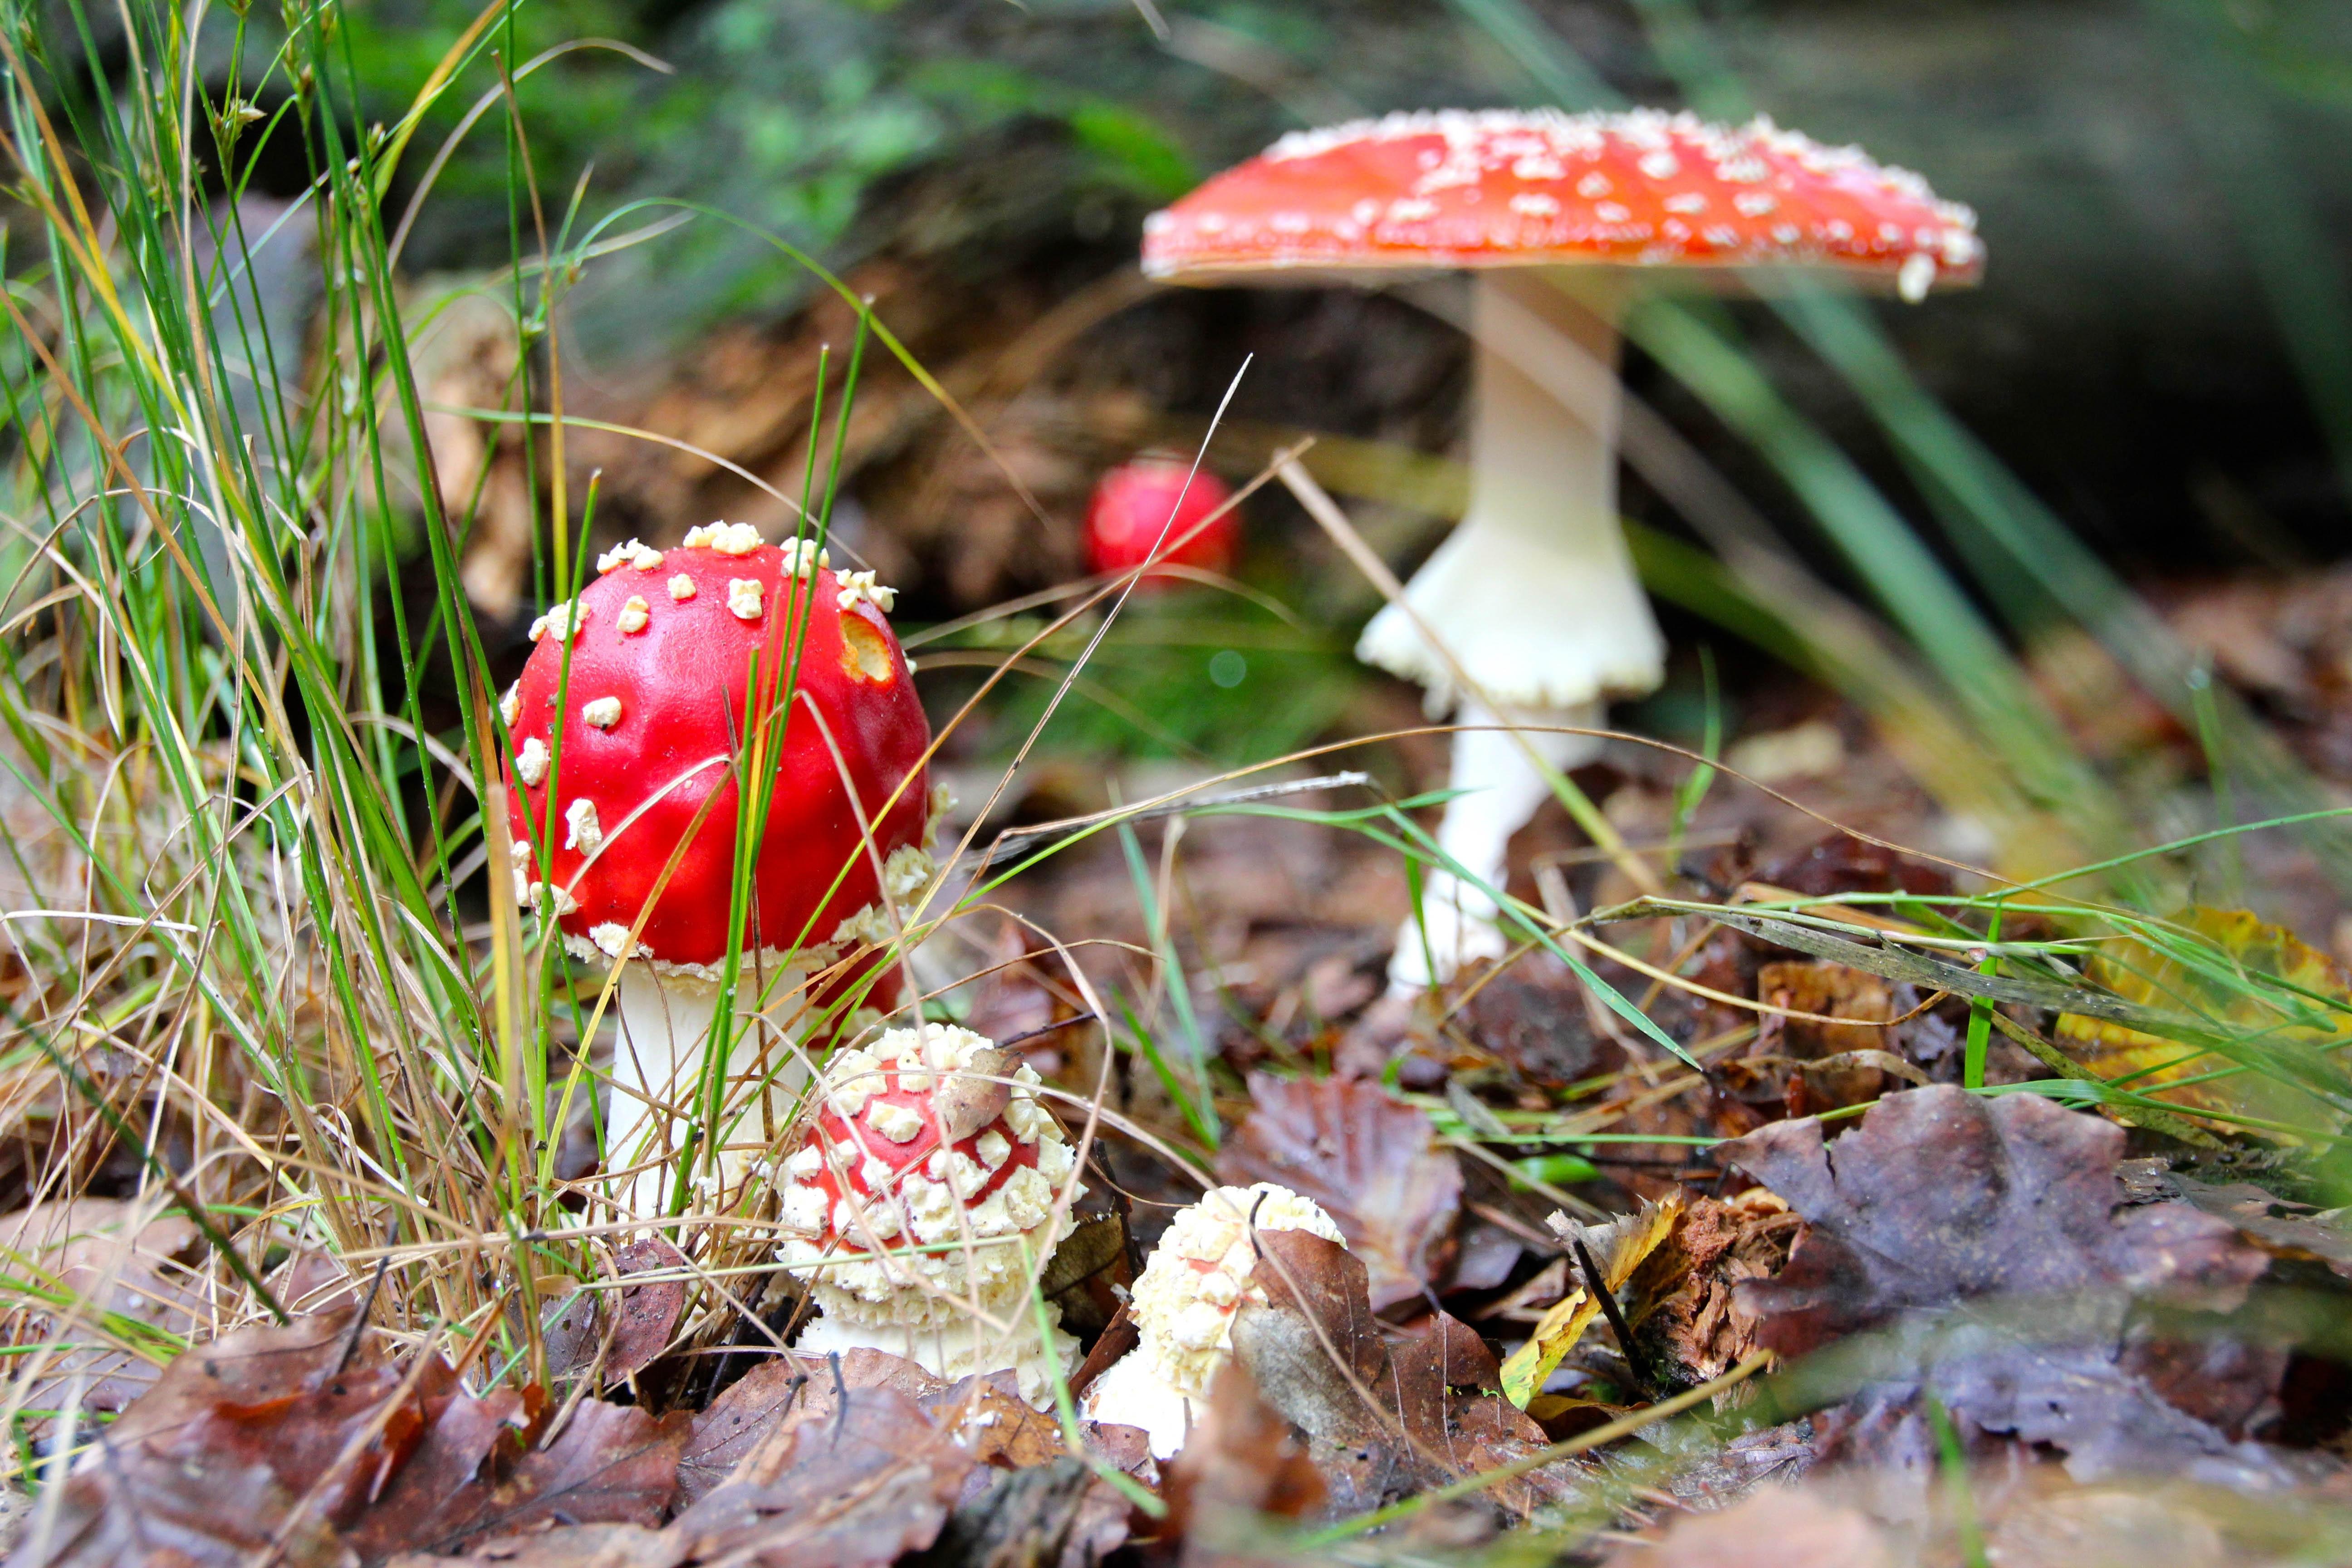 Free Images : nature, plant, leaf, flower, autumn, botany, flora, wildflower, forest floor, fungus, mushrooms, fly agaric, woodland, macro ...5184 x 3456 jpeg 2429kB